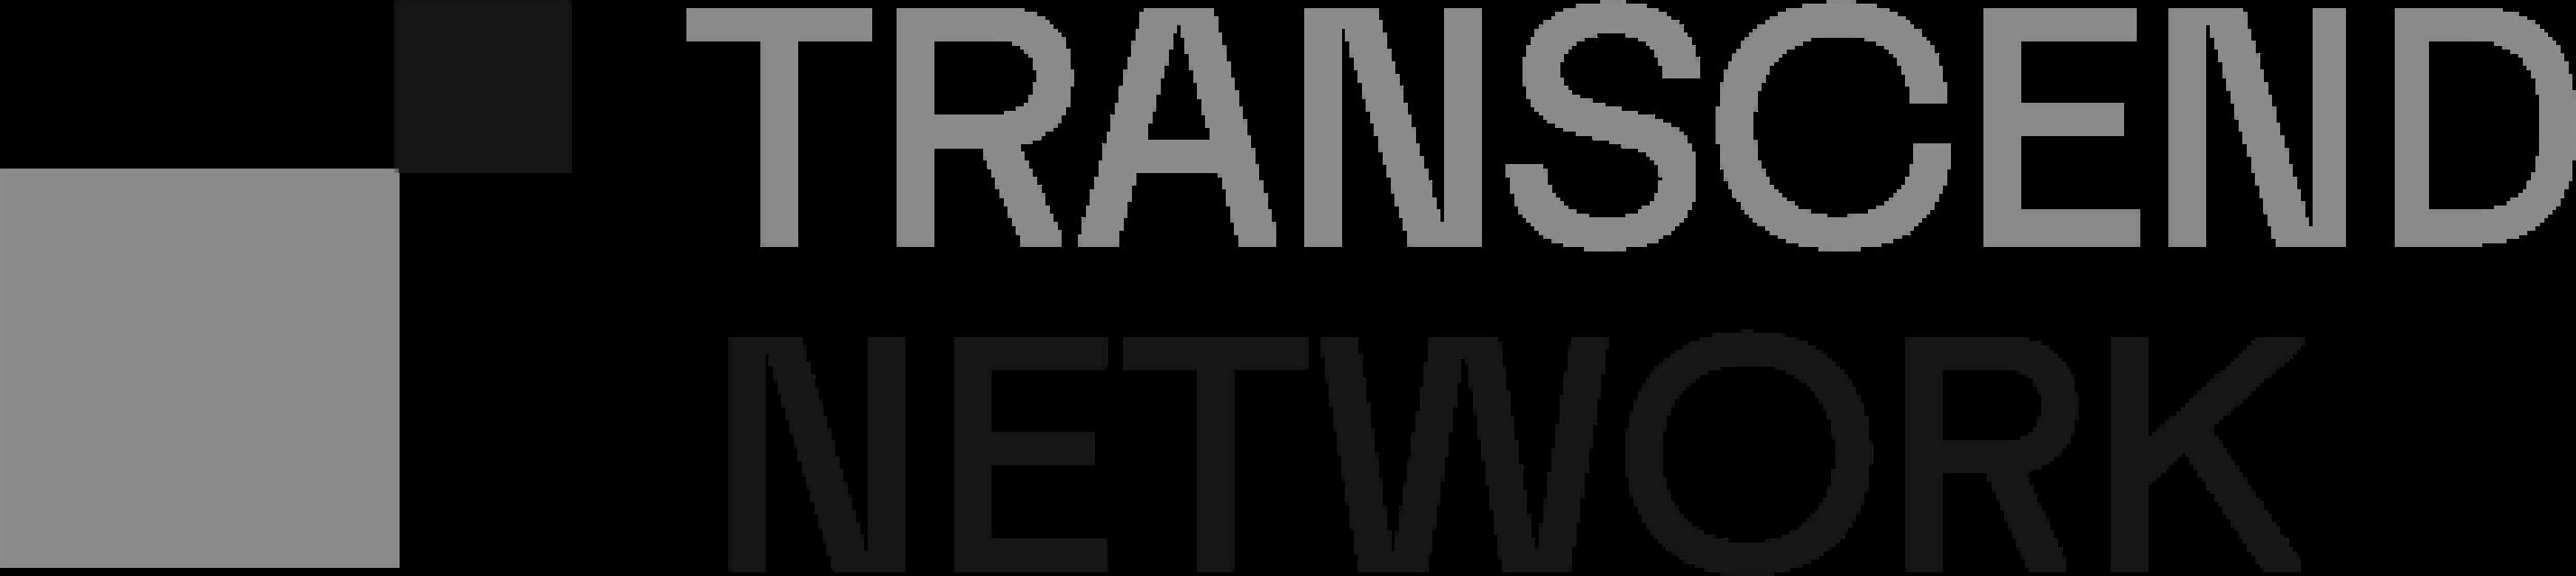 Transcend Network logo.